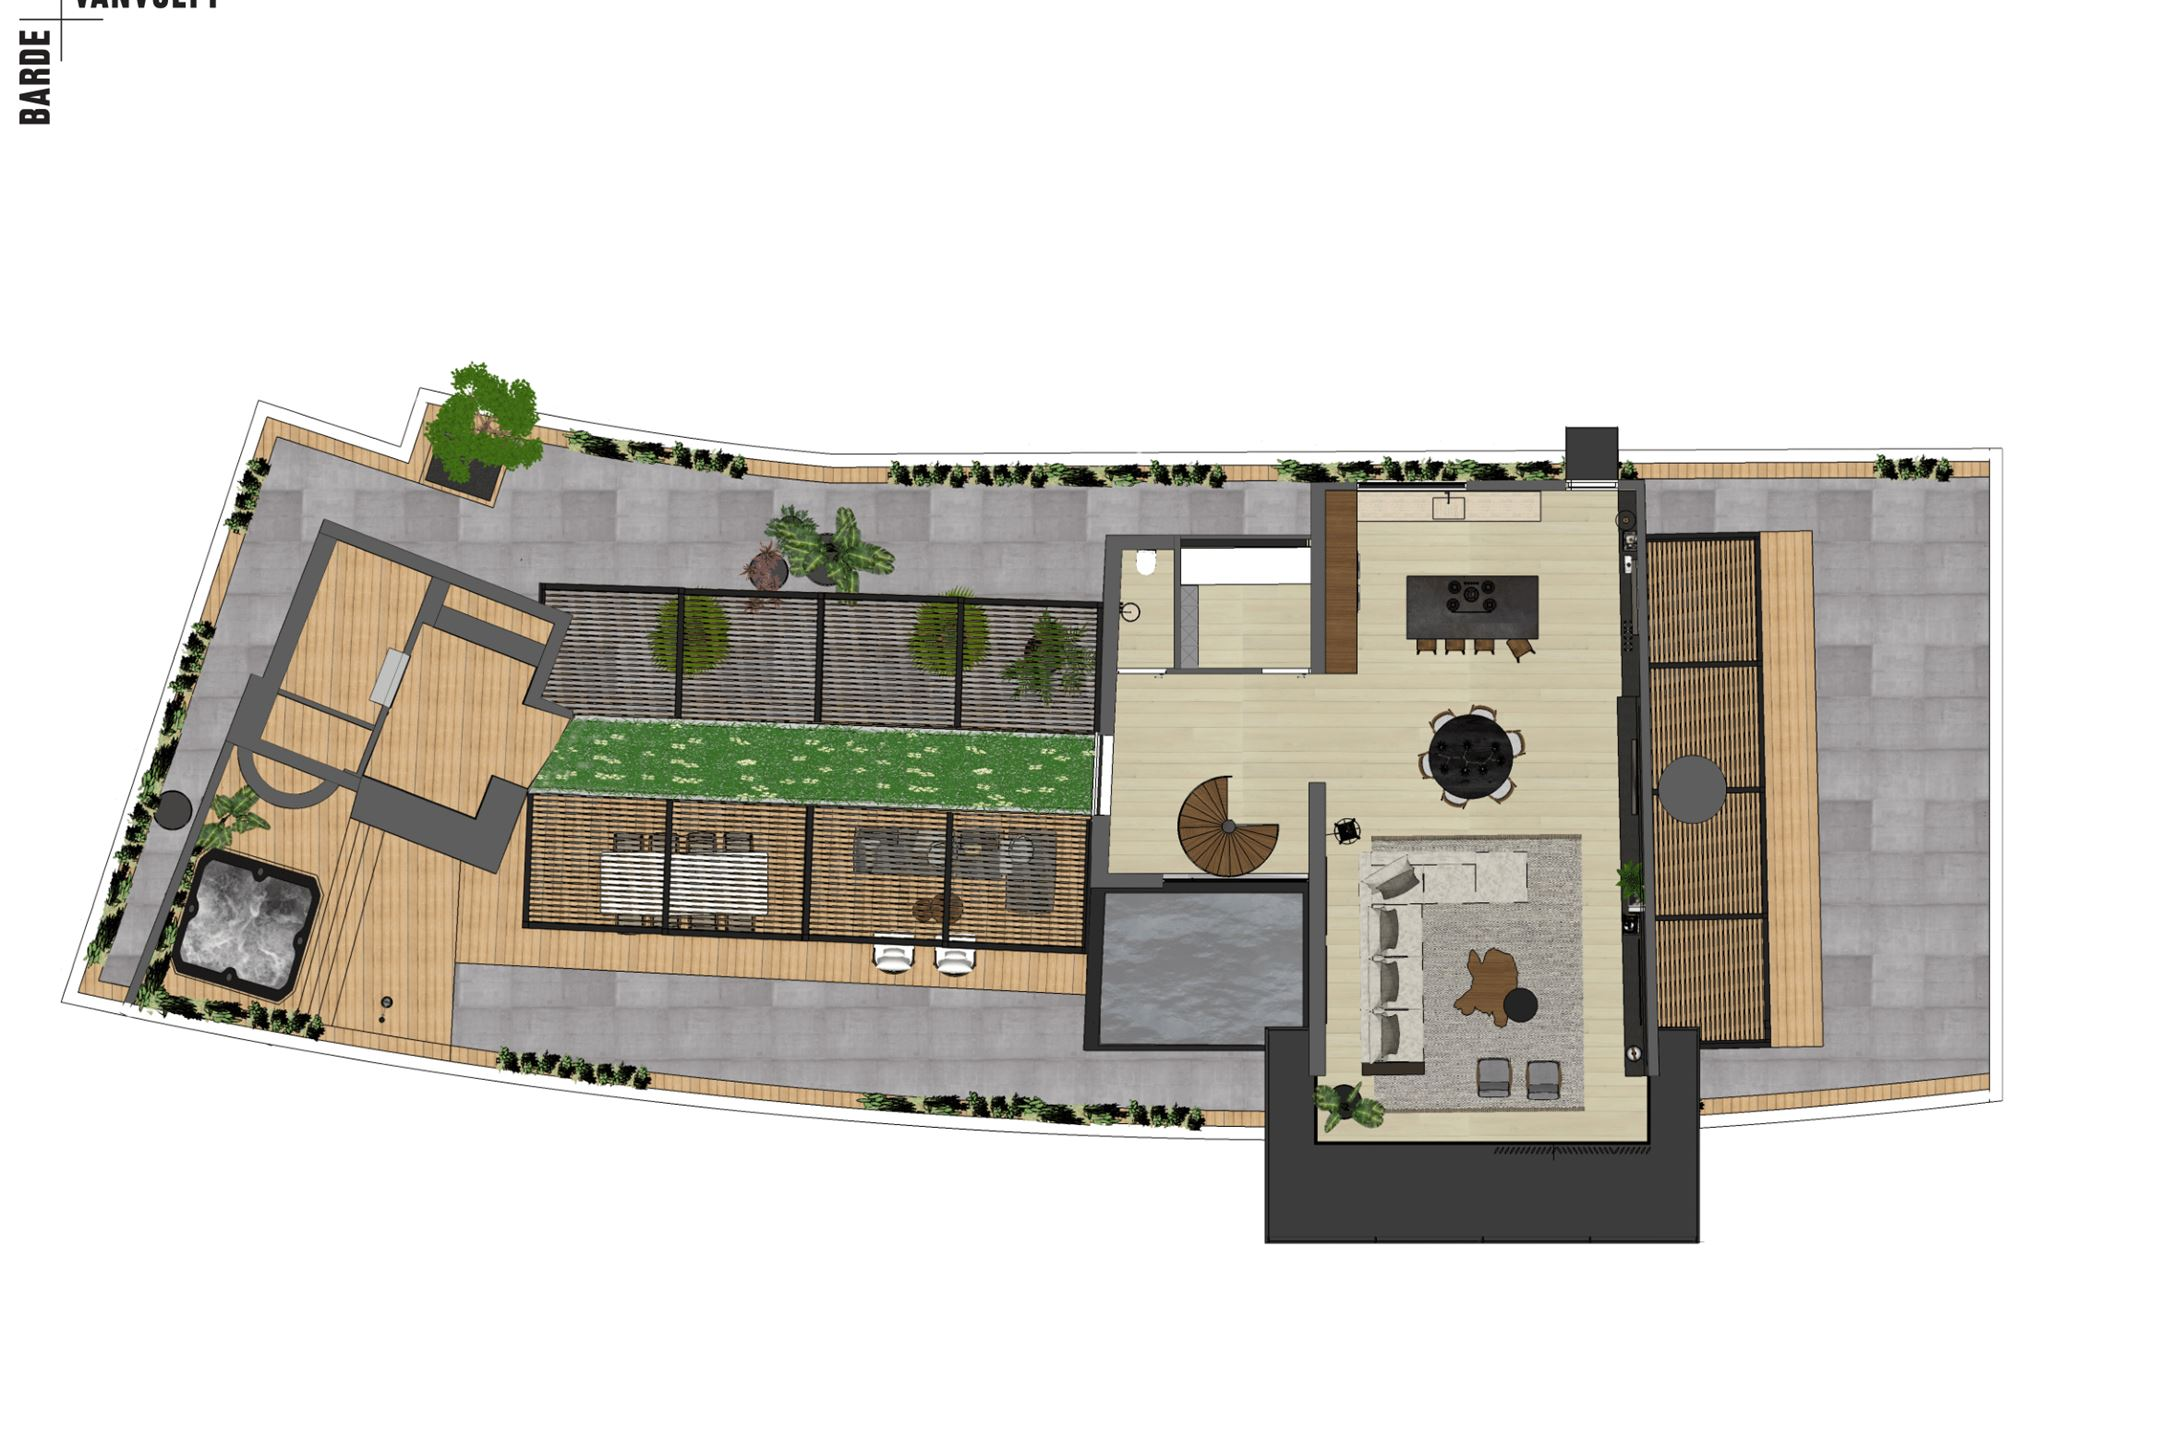 Appartement te koop: Overtoom 545 C+D 1054 LK Amsterdam [funda]